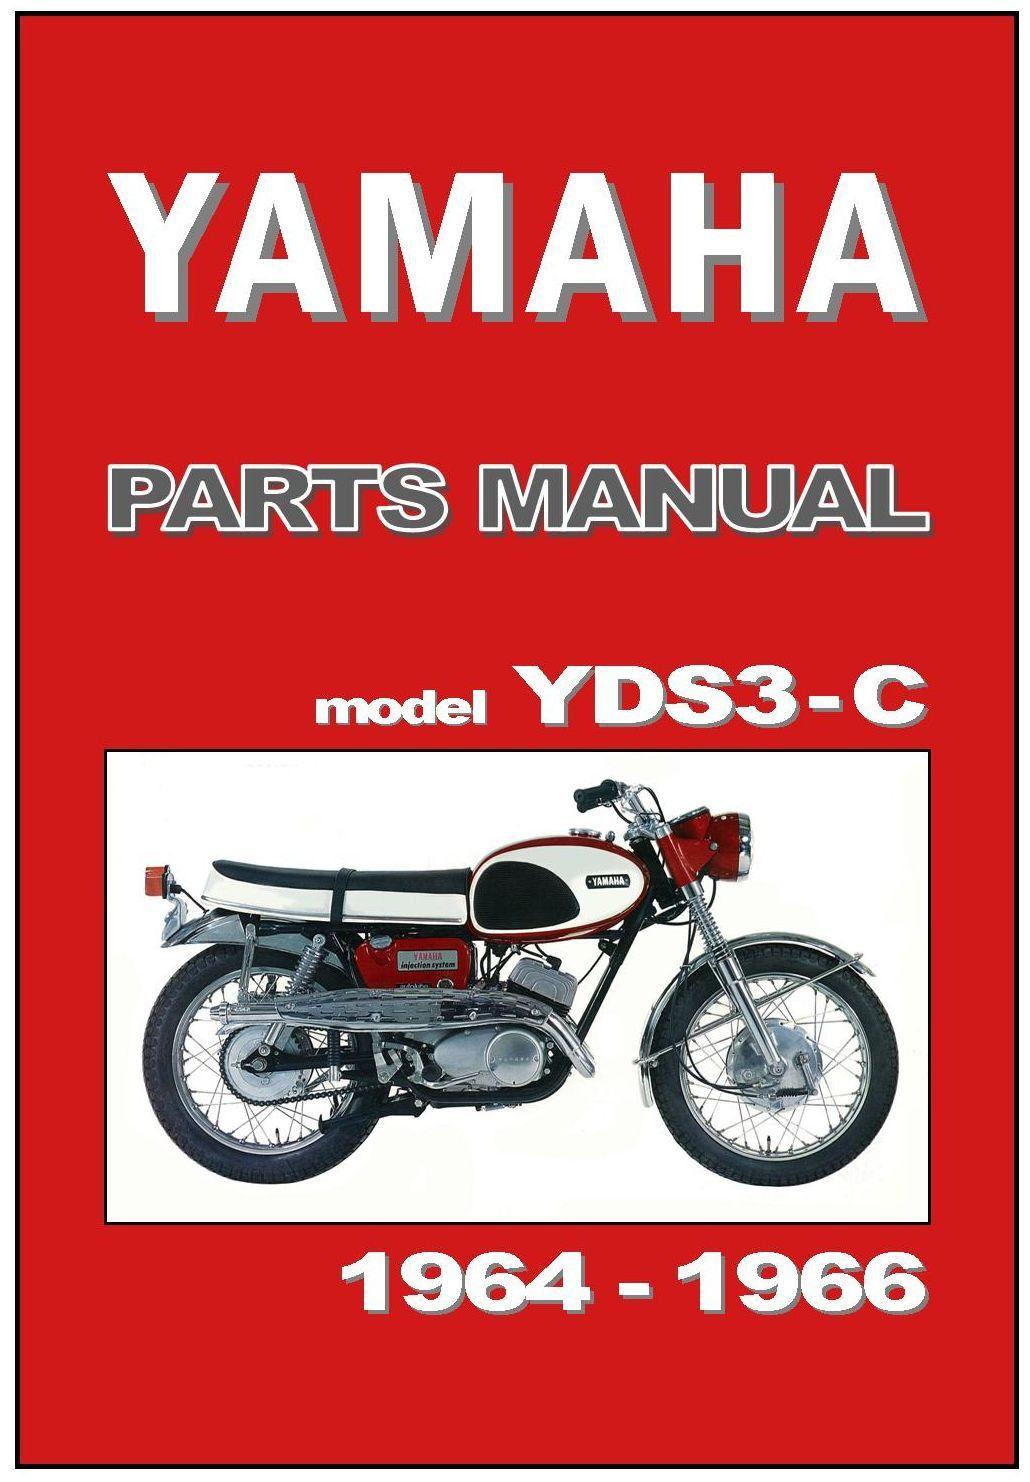 YAMAHA Parts Manual YDS3 YDS3C YDS3-C 1964 1965 1966 Spares Catalog List |  eBay